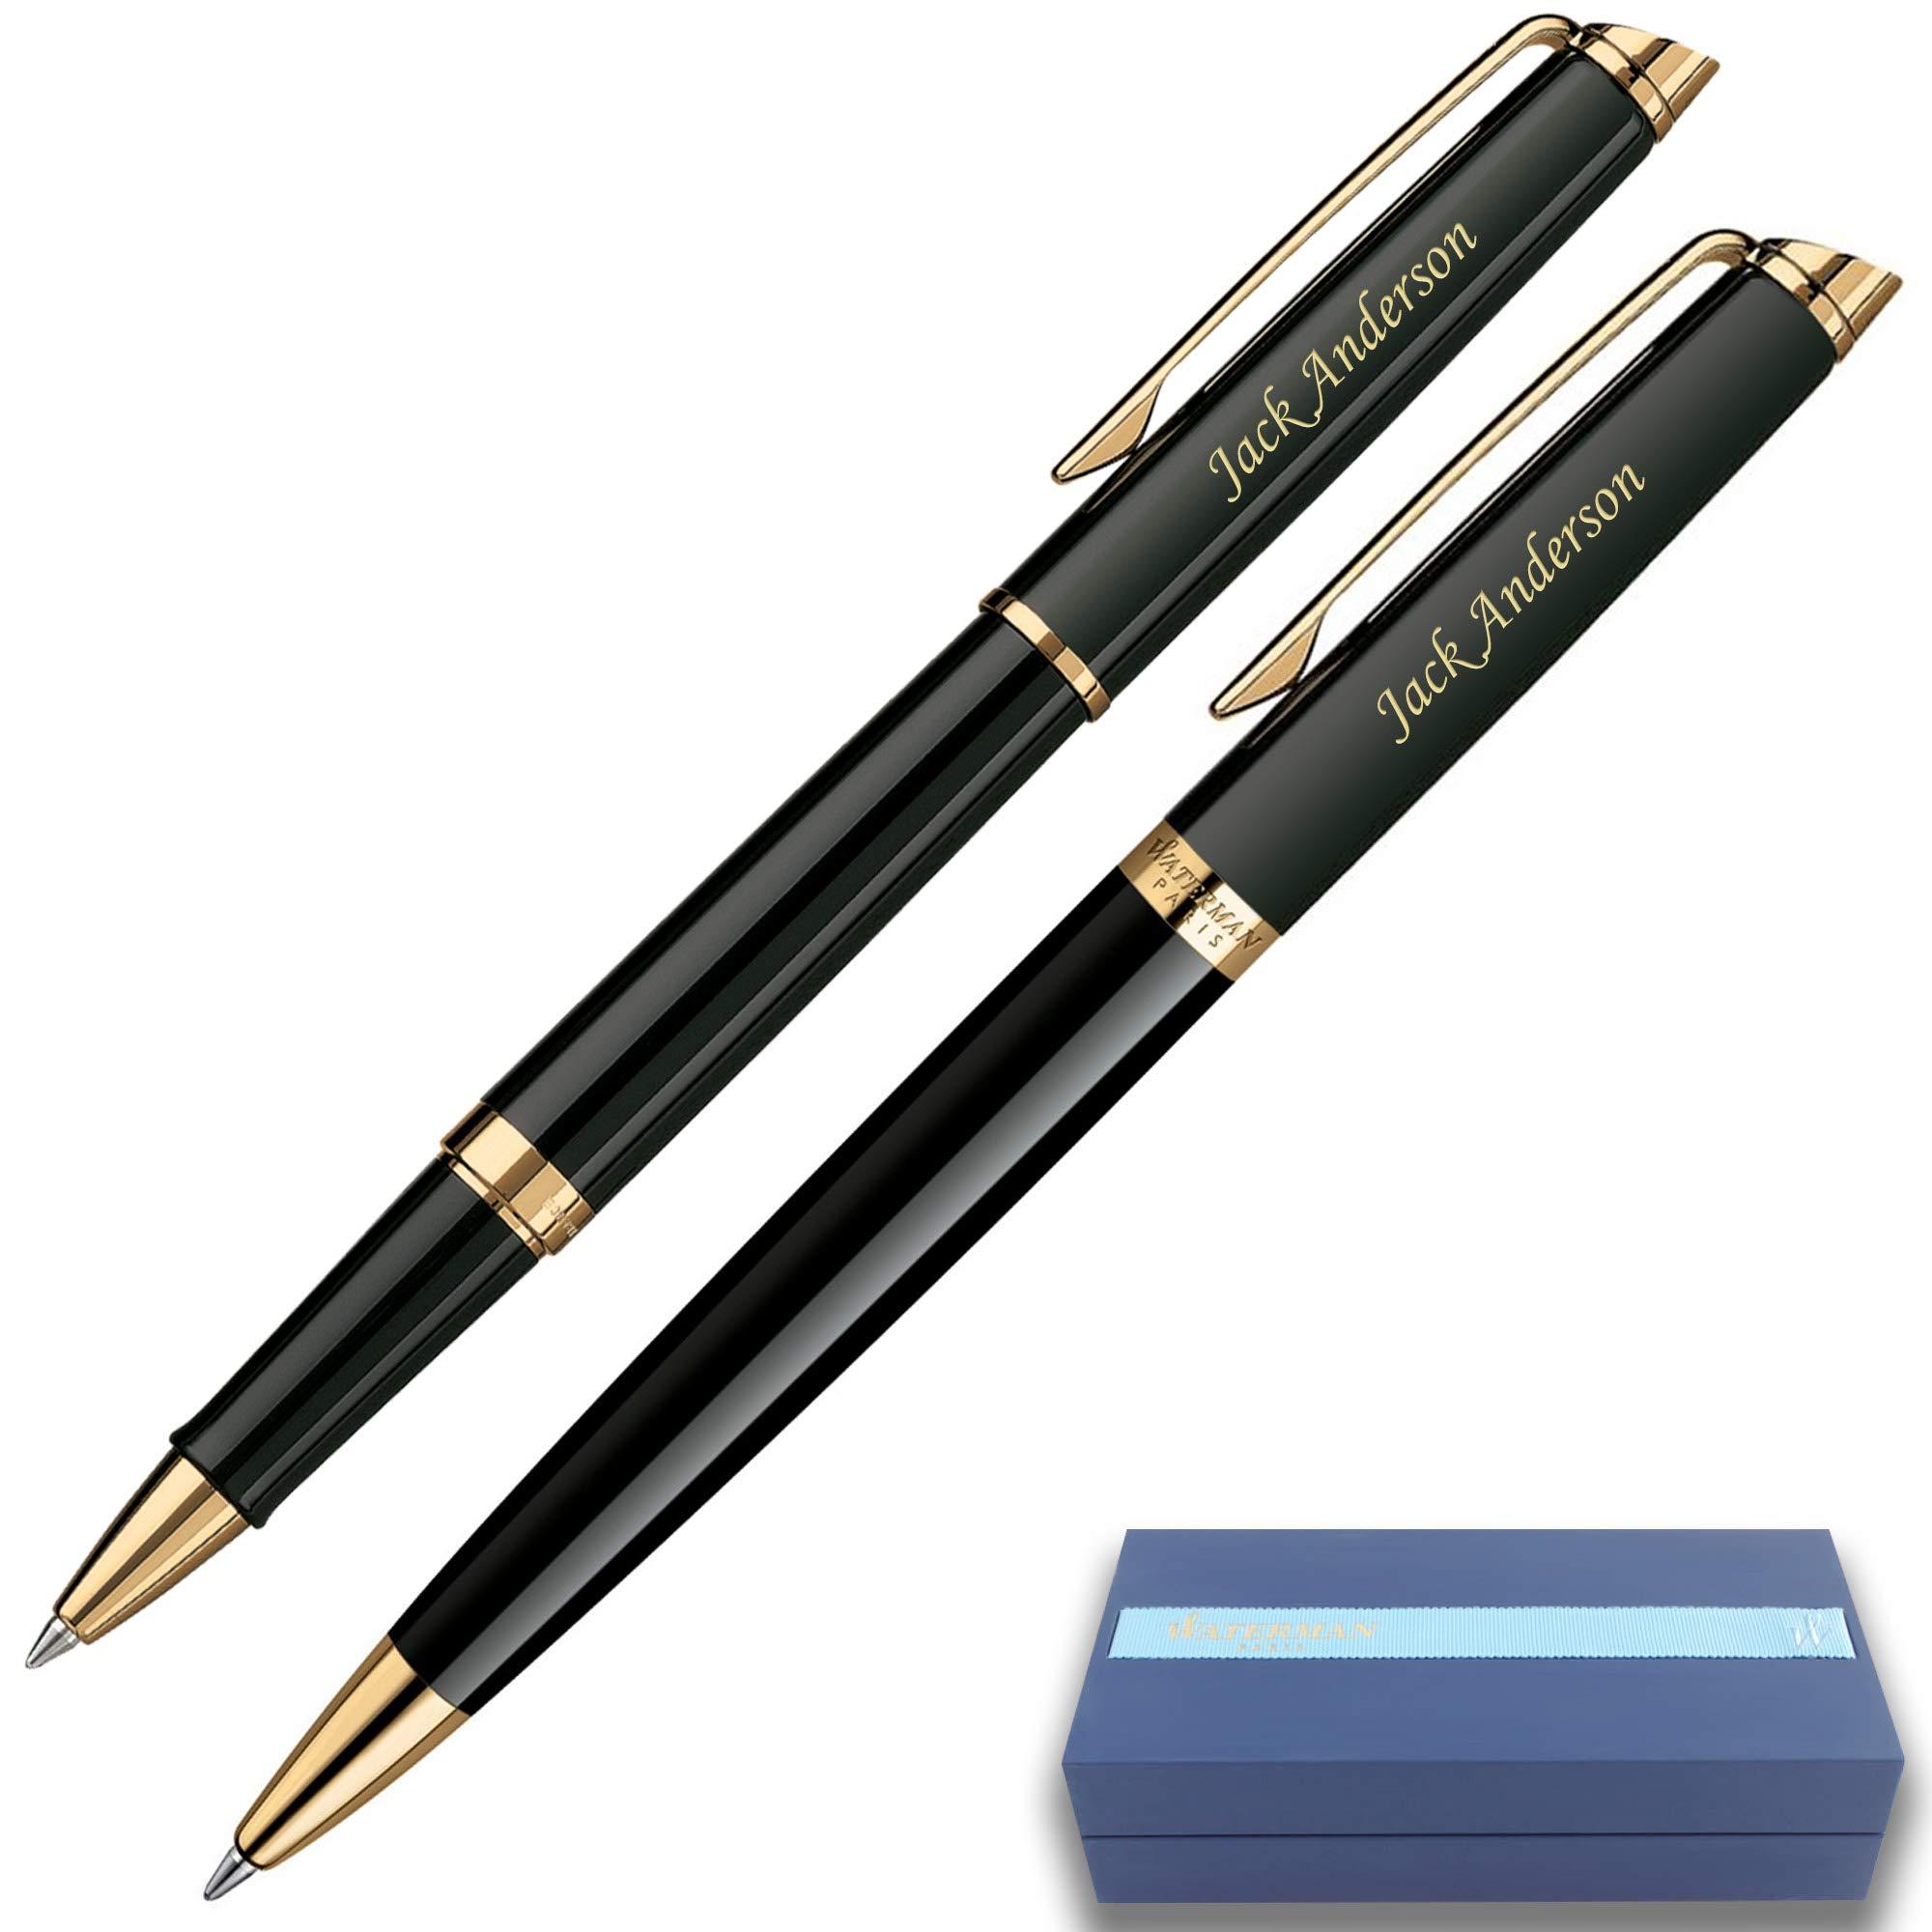 Personalized Waterman Pen | Engraved Waterman Hemisphere Rollerball & Ballpoint Gift Pen Set - Black. Custom Engraved By Dayspring Pens.